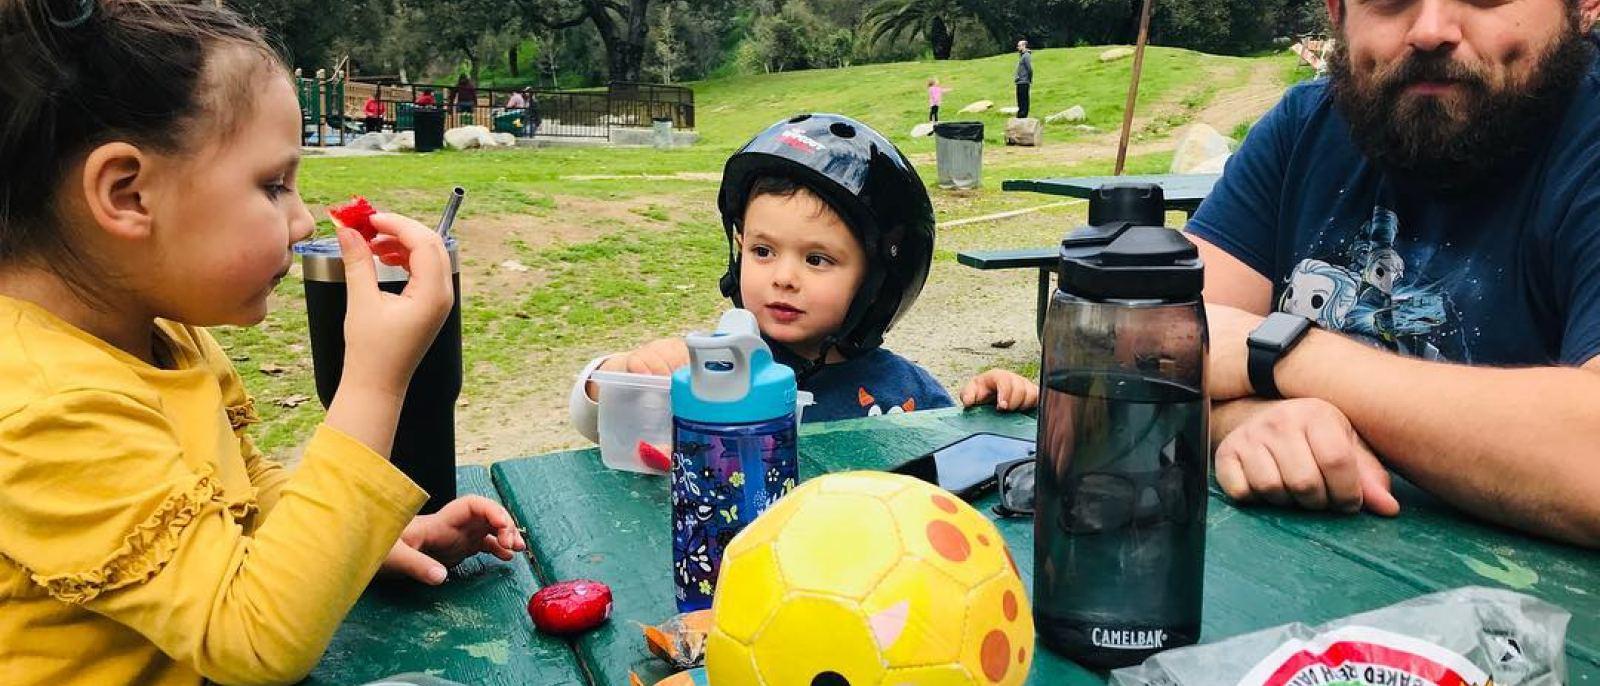 Picnicat Brookside Park in Pasadena